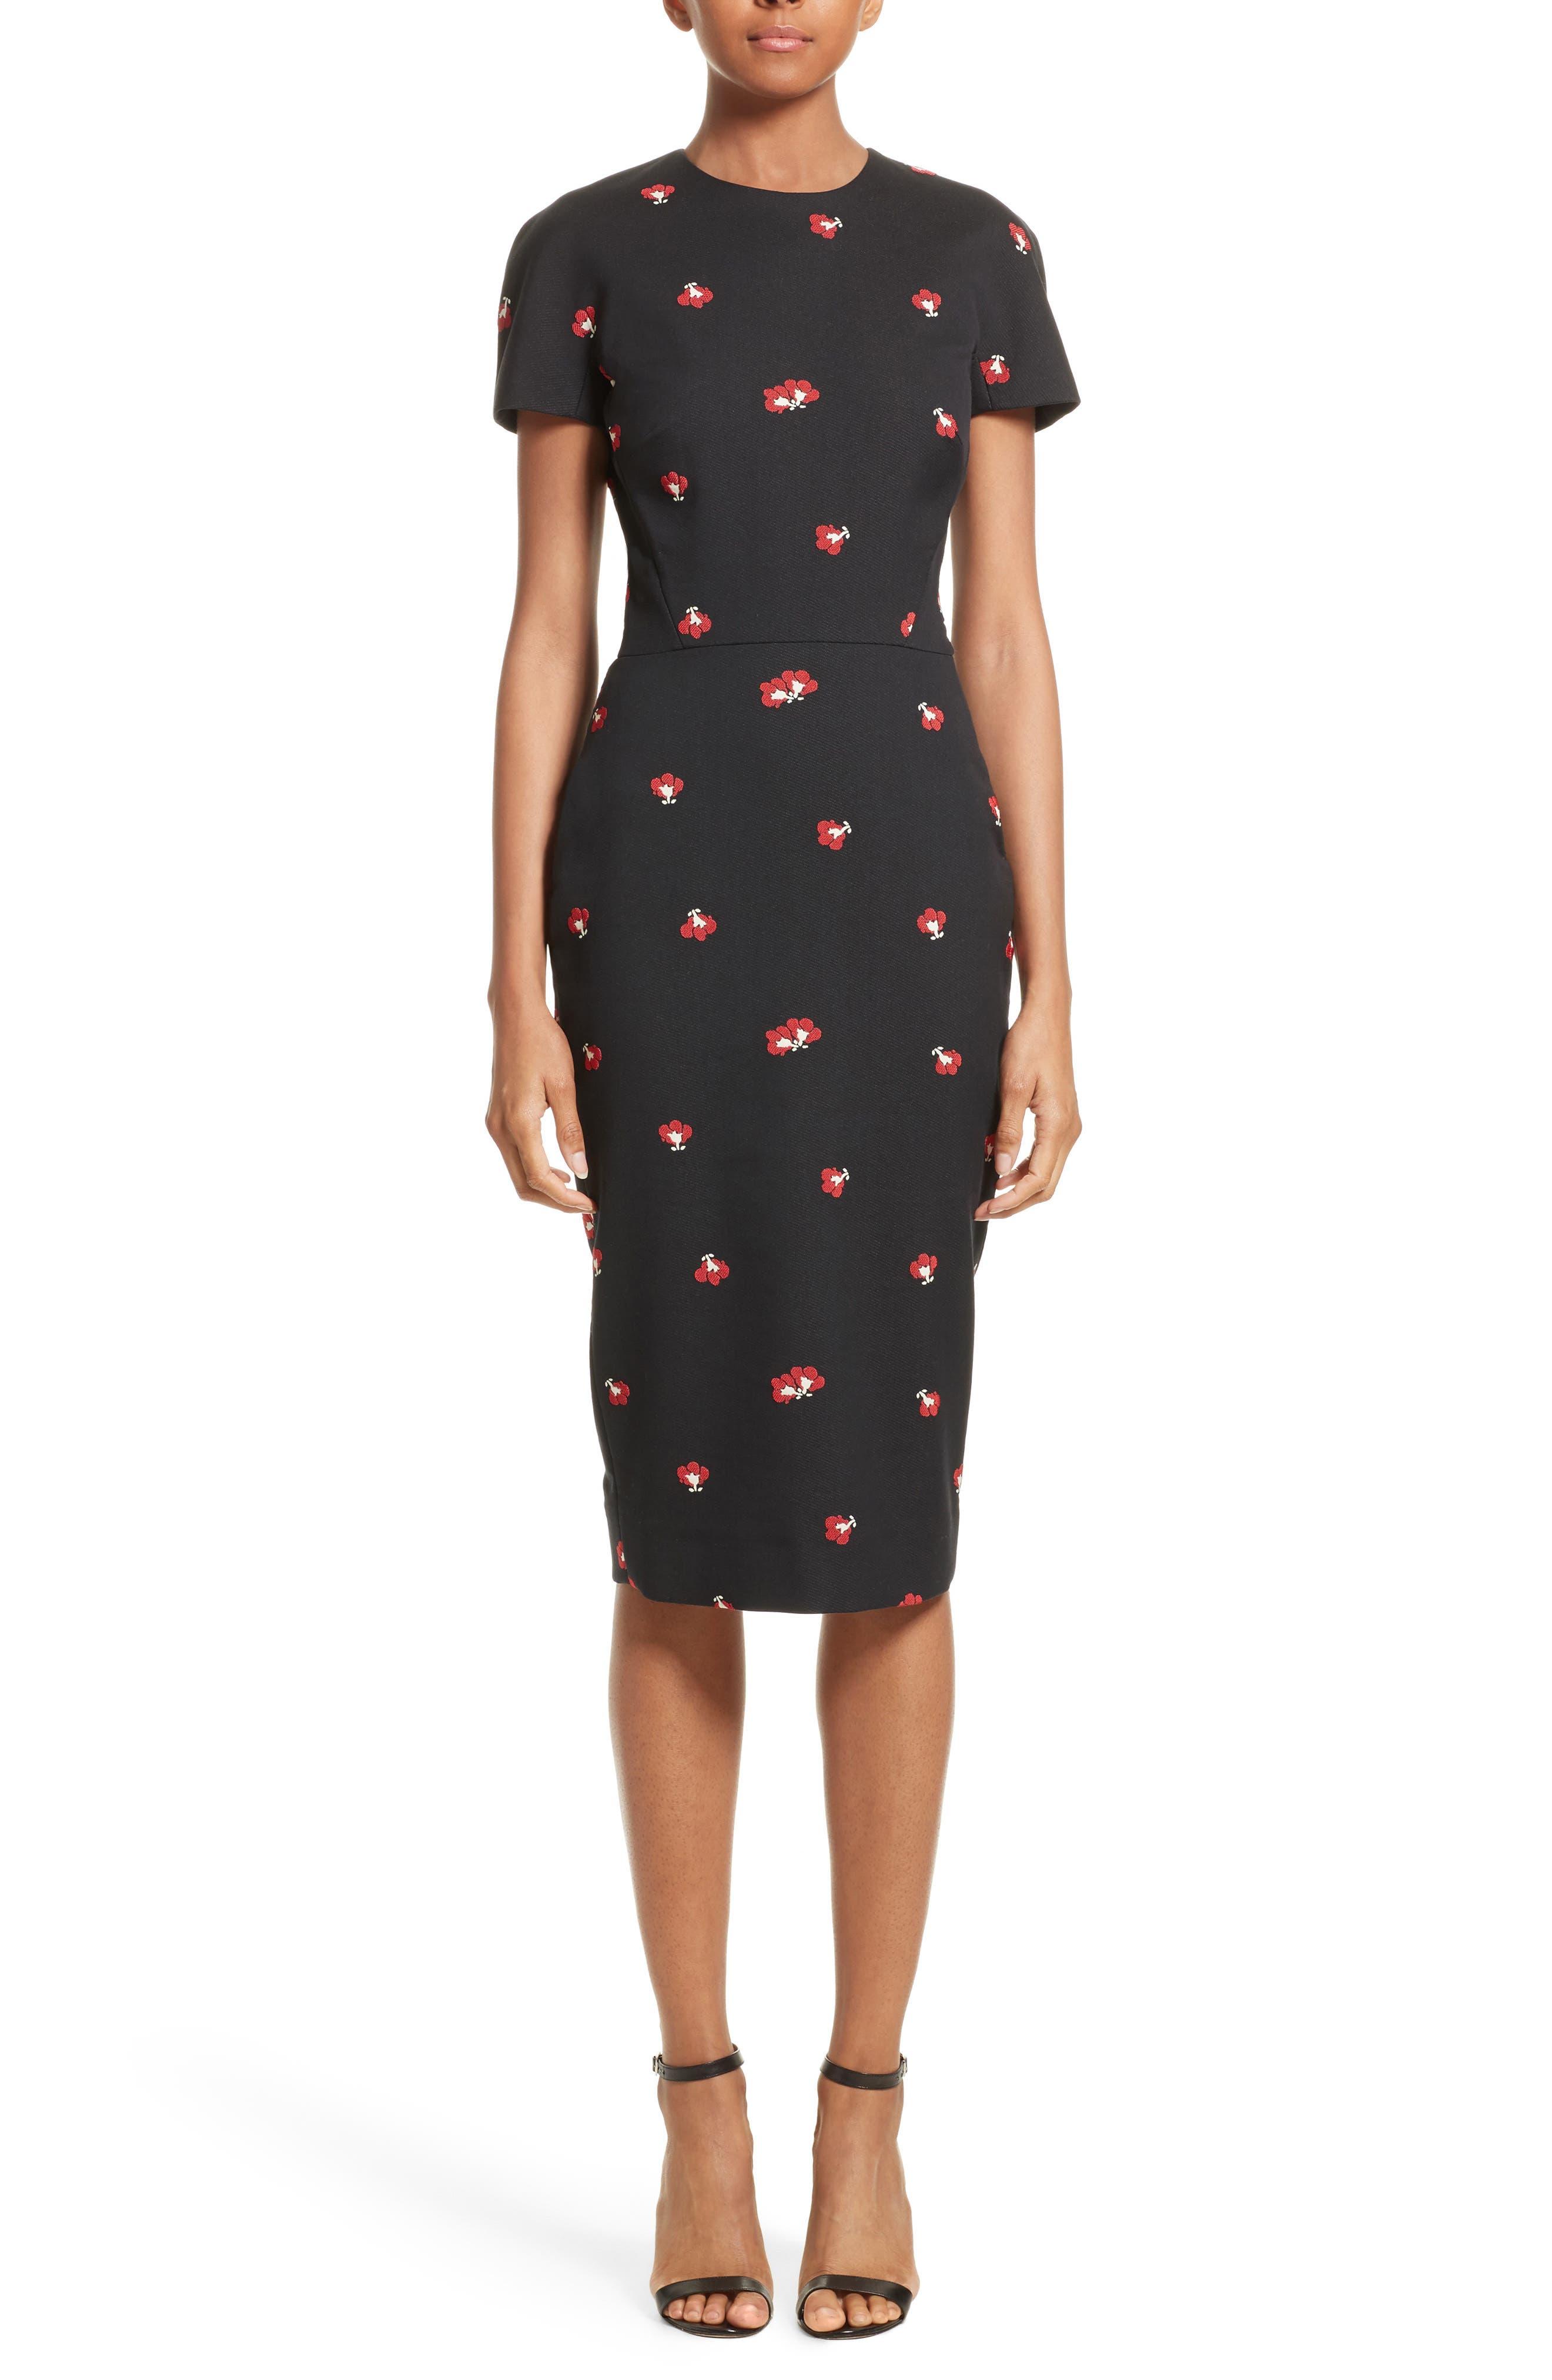 Flower Print Pencil Dress,                             Main thumbnail 1, color,                             Black/ Red